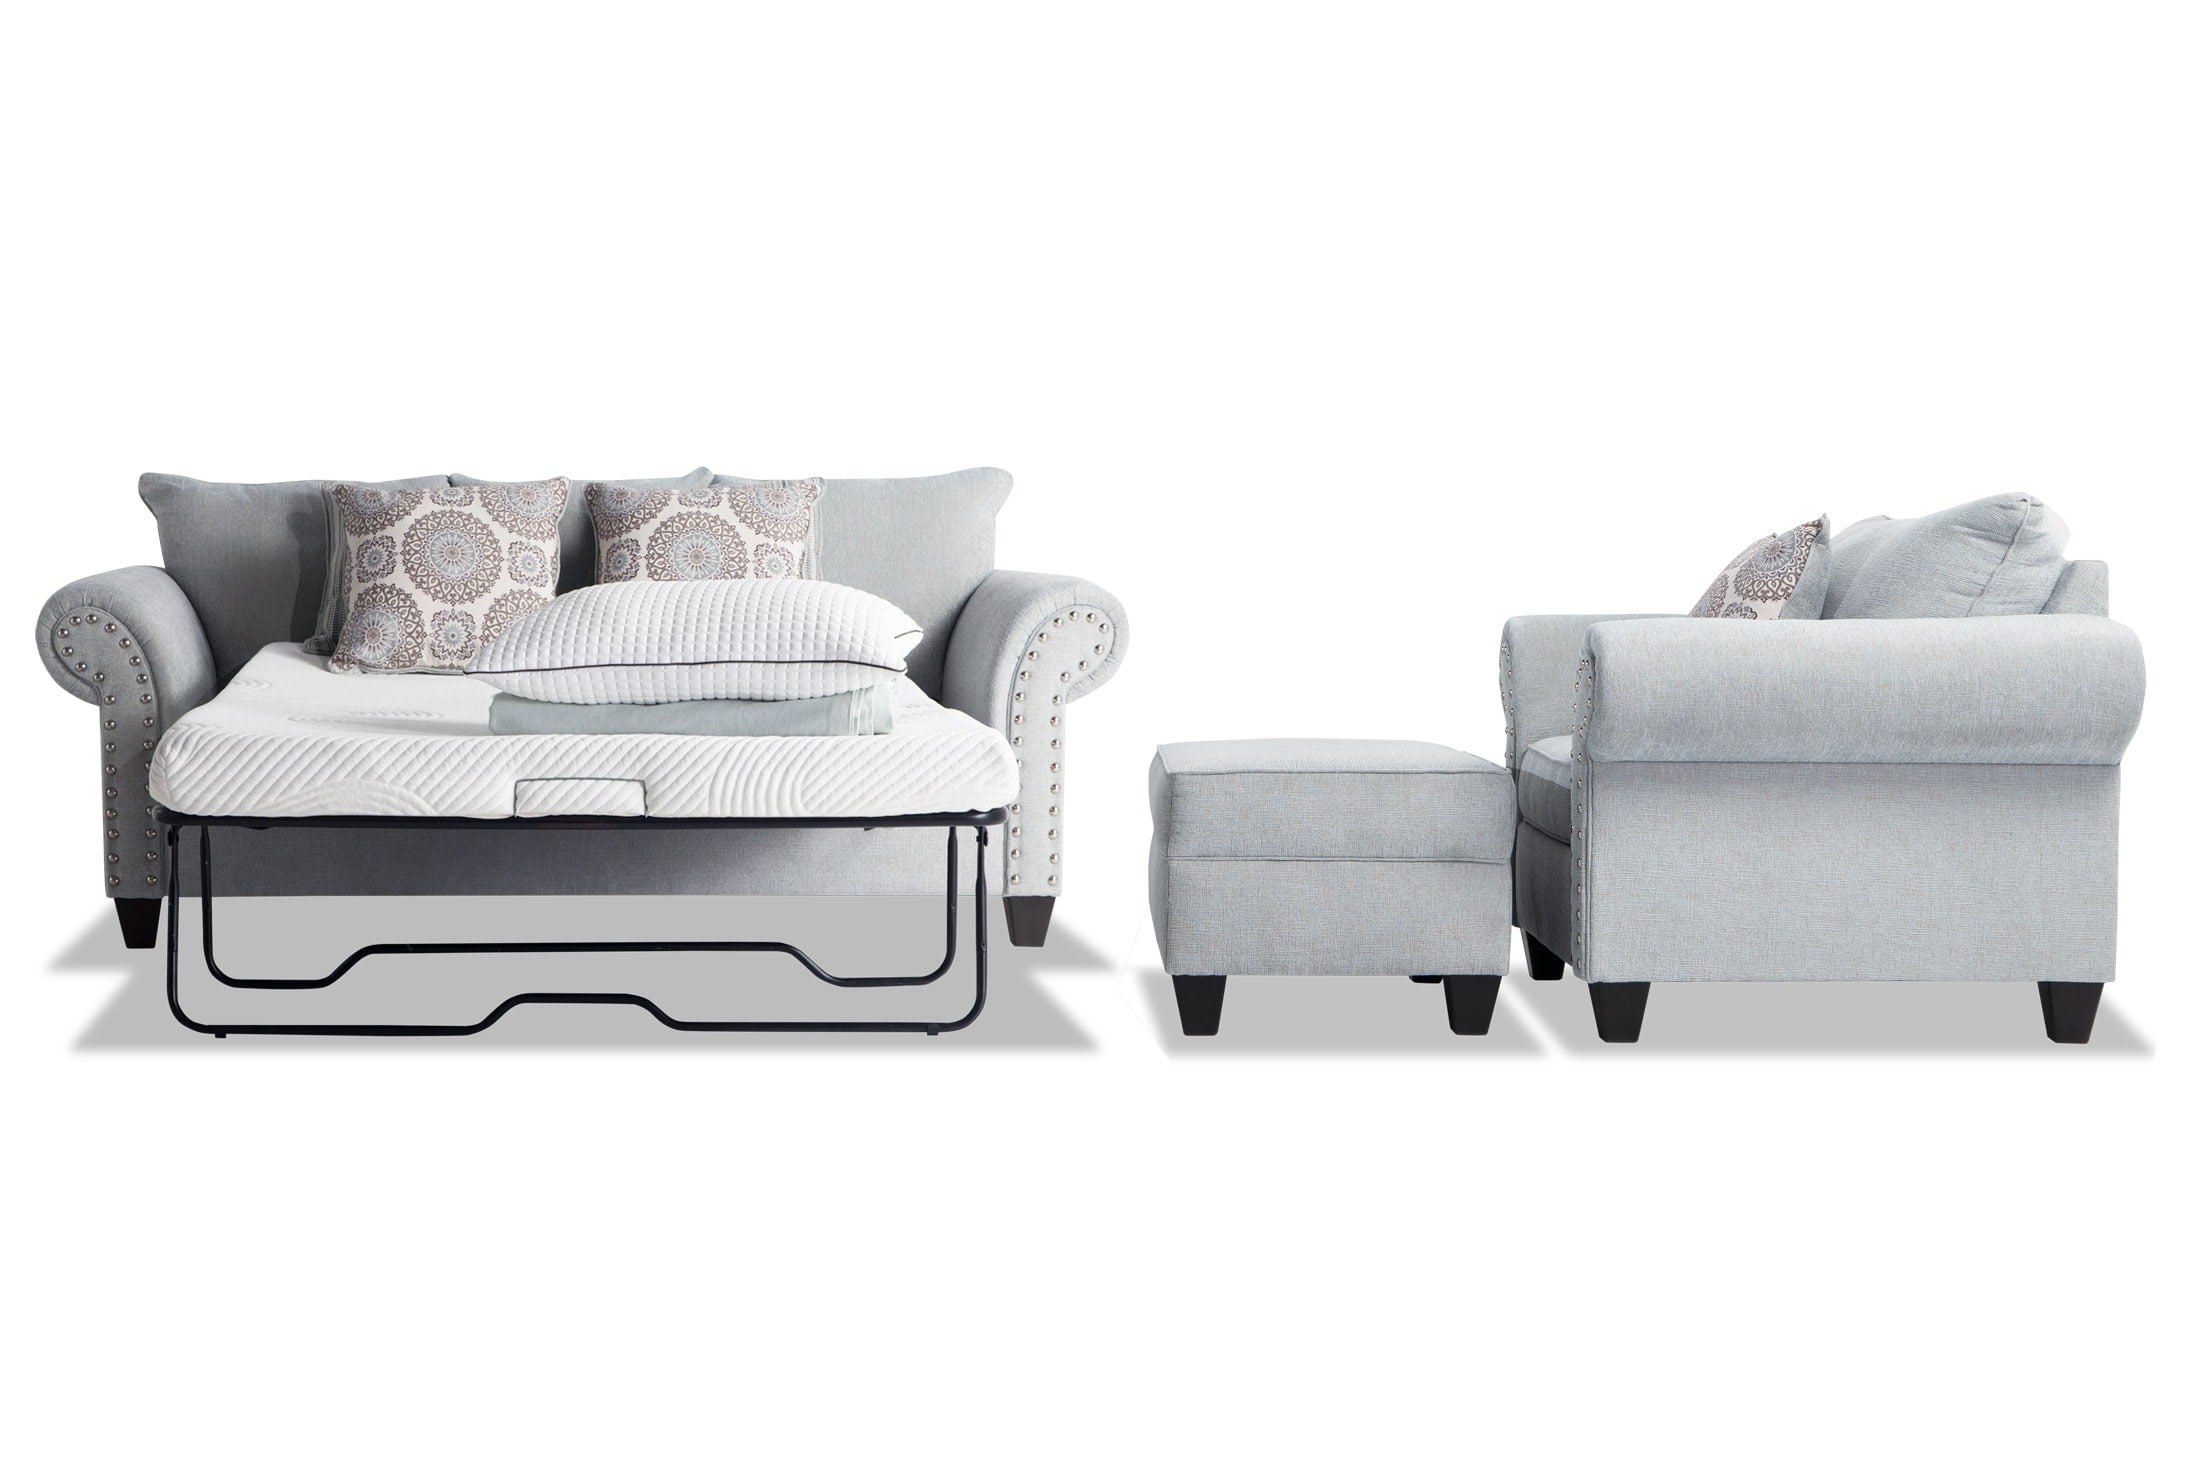 Bob O Pedic Full Sleeper Sofa